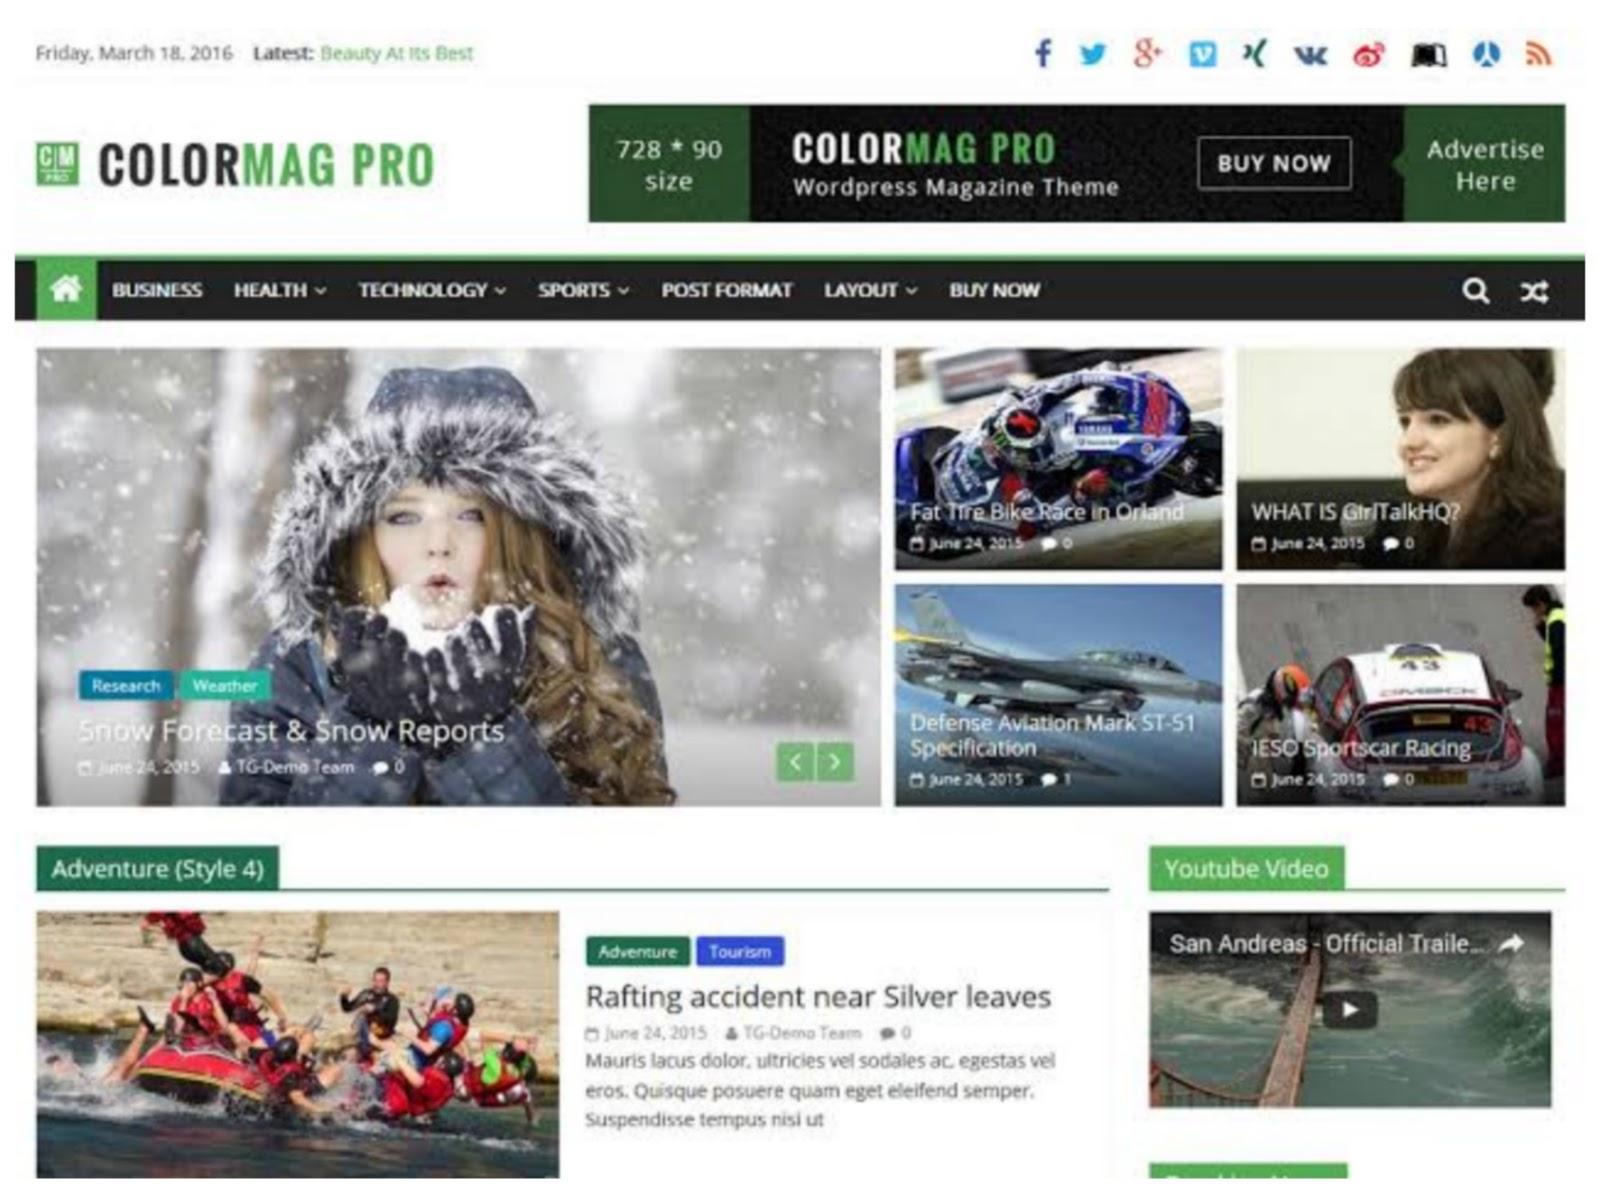 ColorMag Pro WordPress Theme